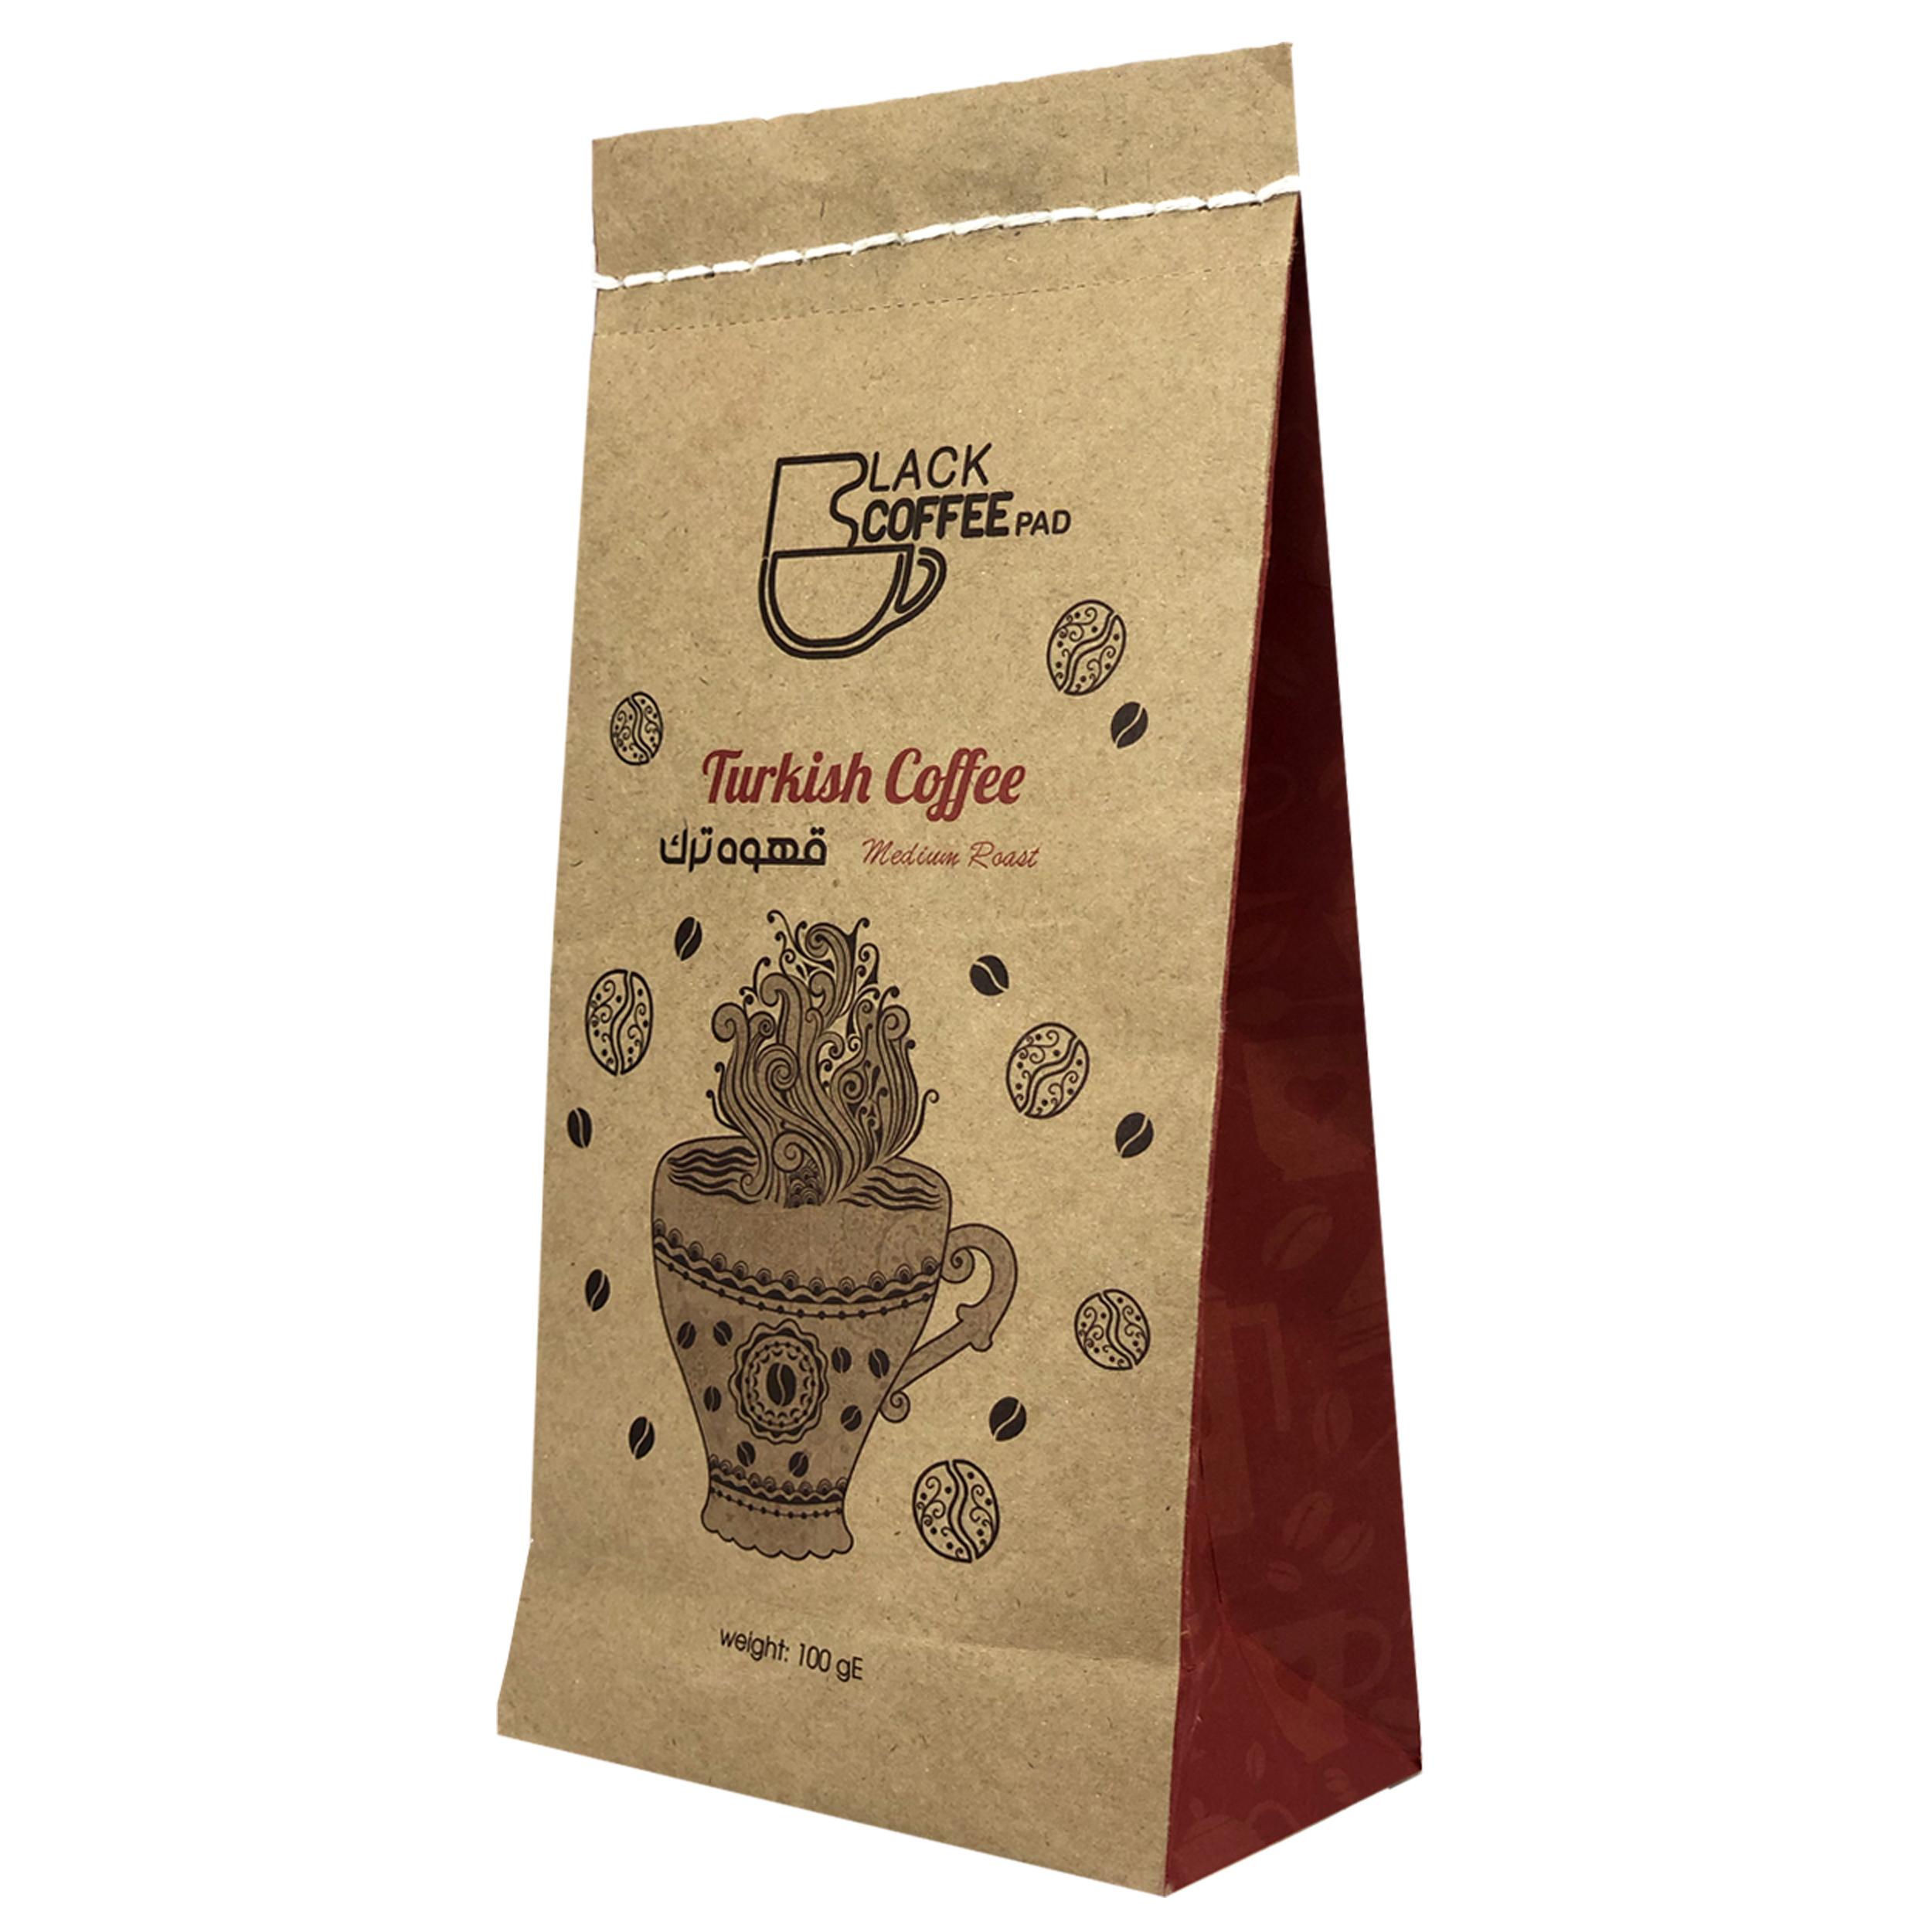 قهوه ترک مدیوم بلک کافی کد Tm13 مقدار 100 گرم